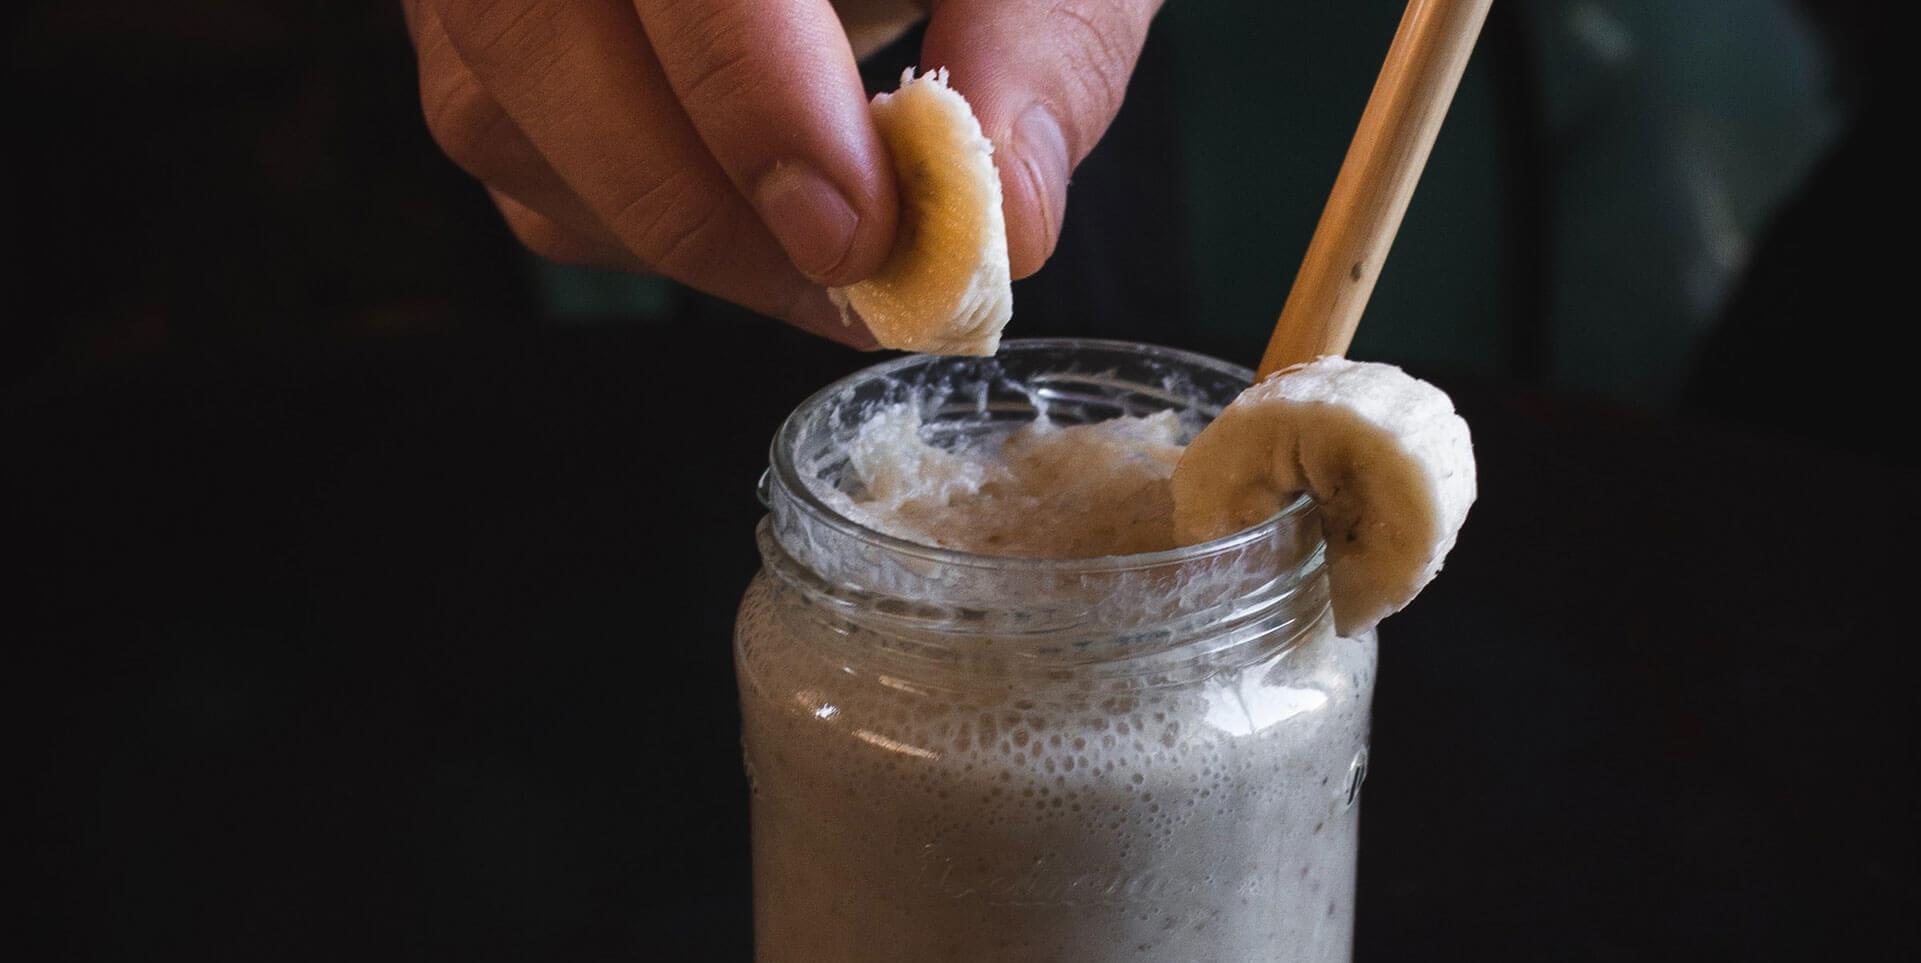 Hand putting banana slice into a Chocolate Banana Smoothie